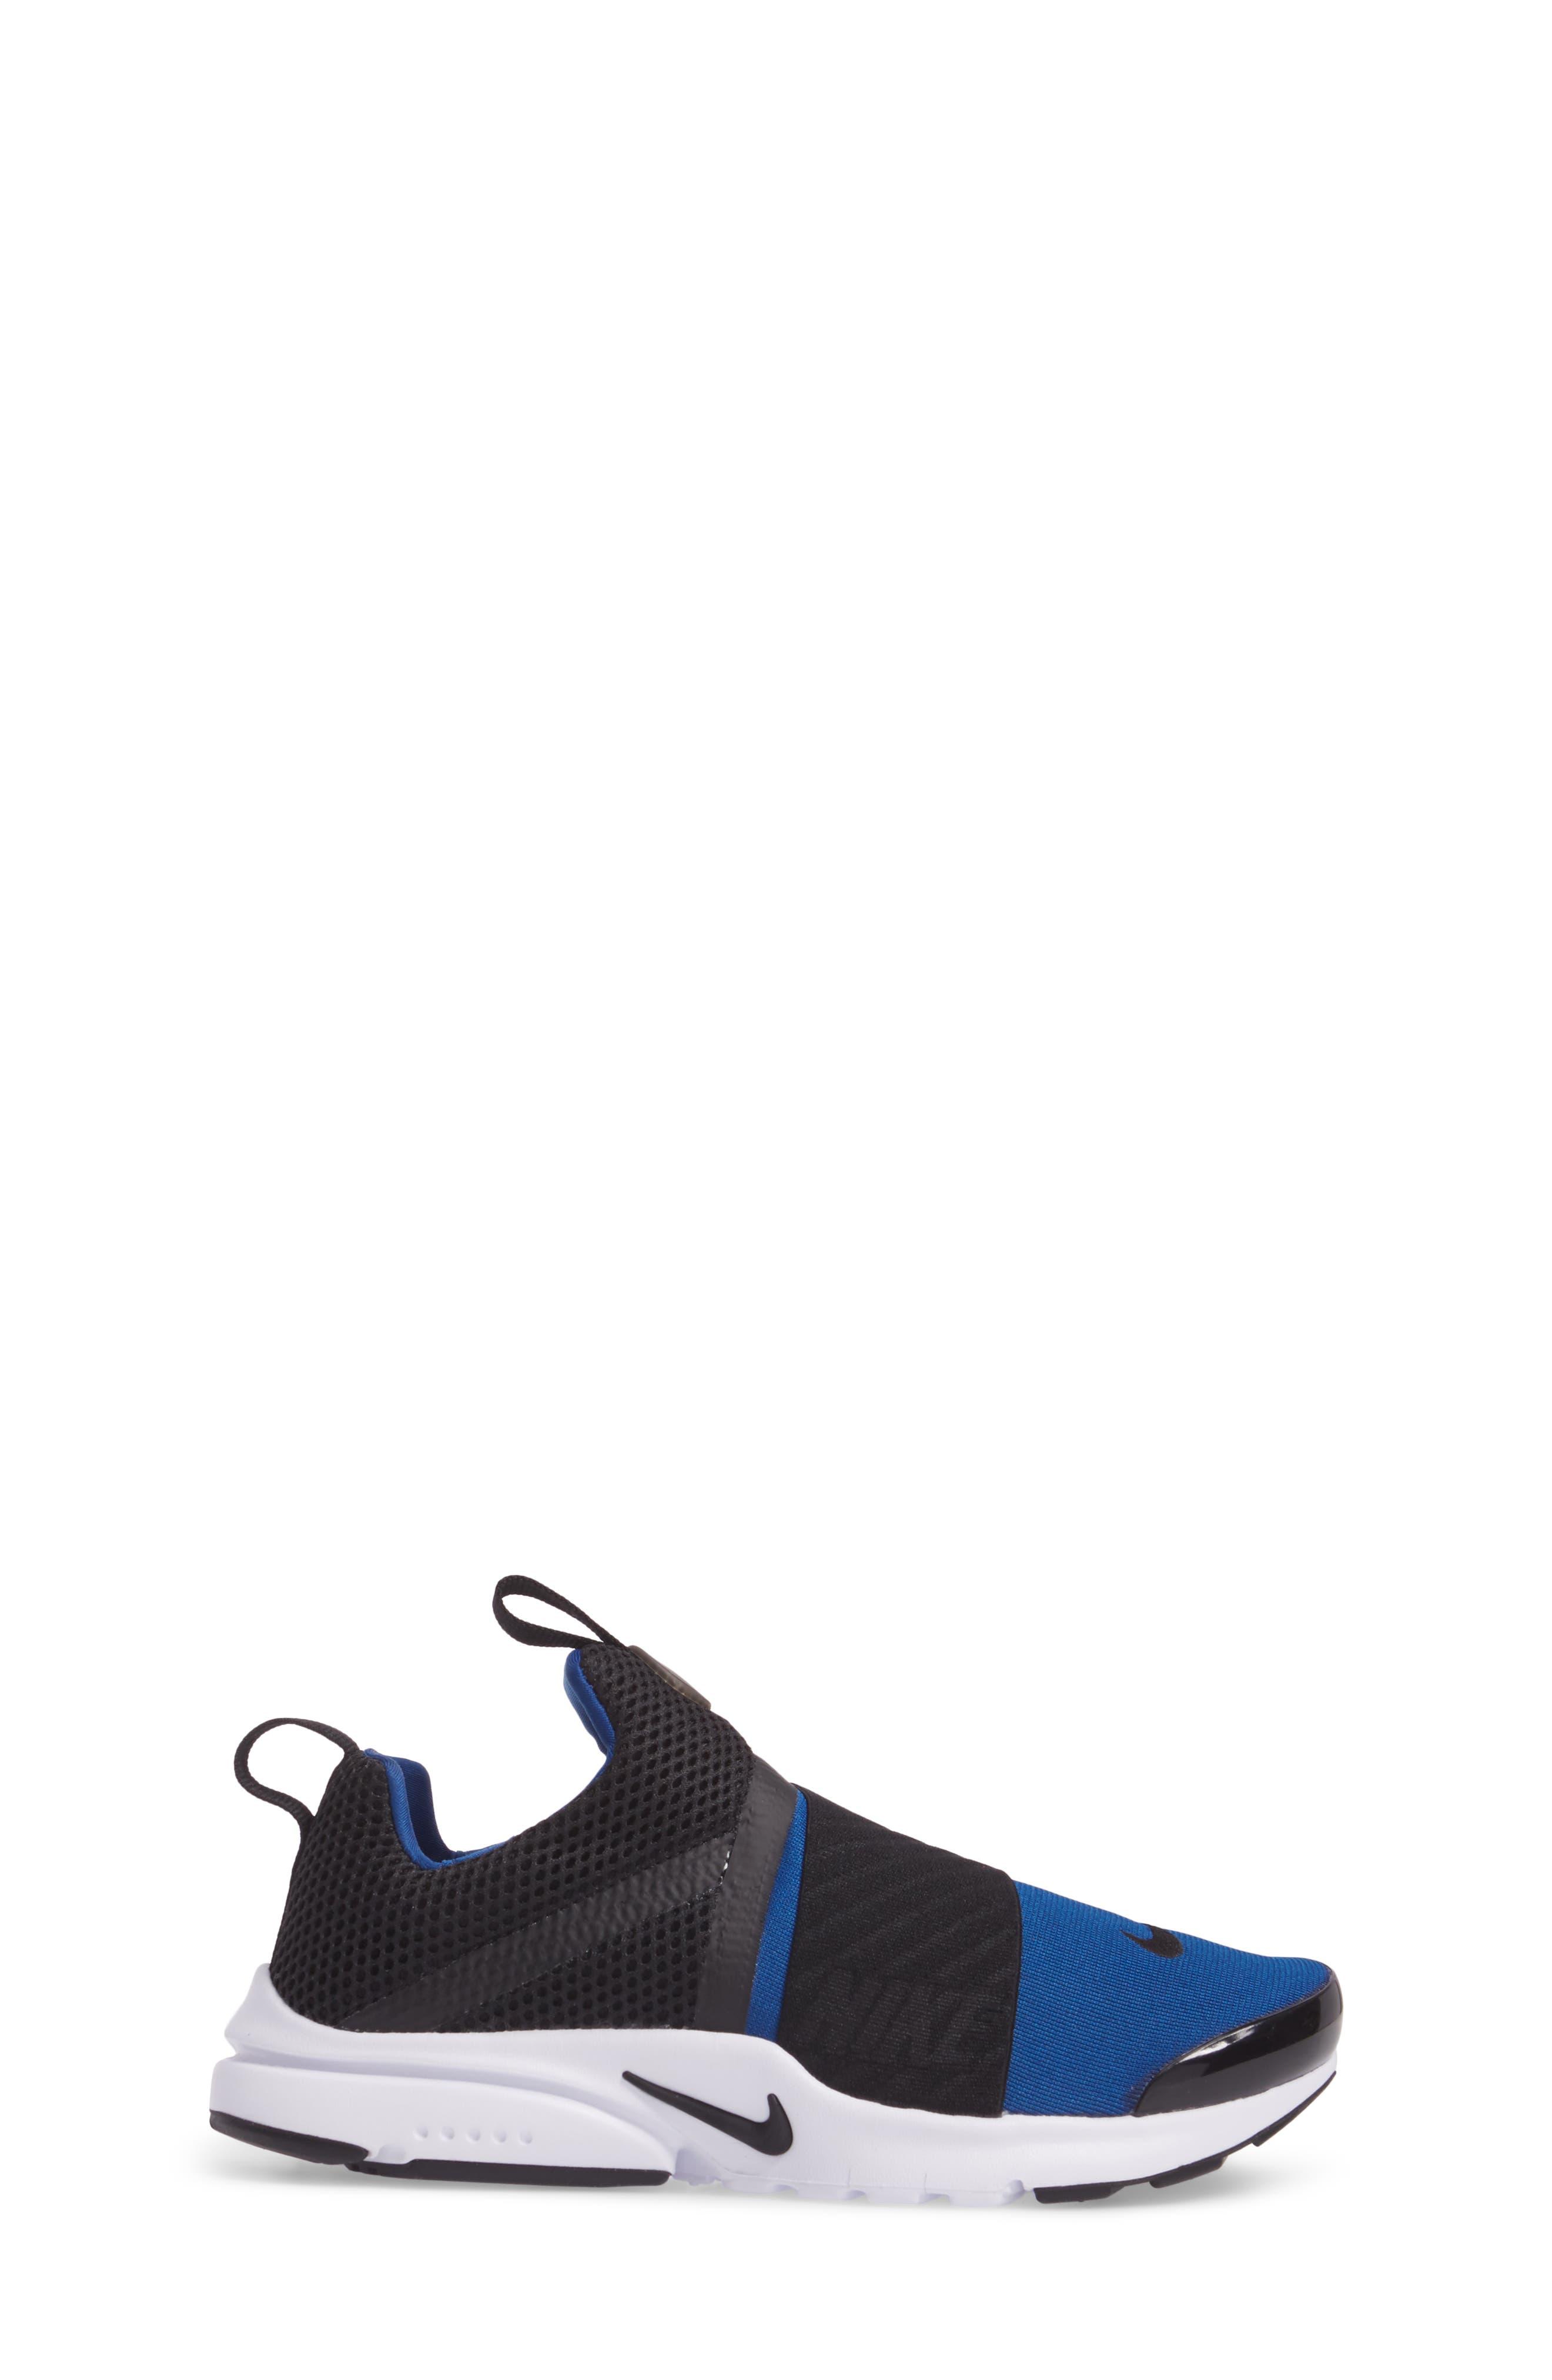 Presto Extreme Sneaker,                             Alternate thumbnail 31, color,